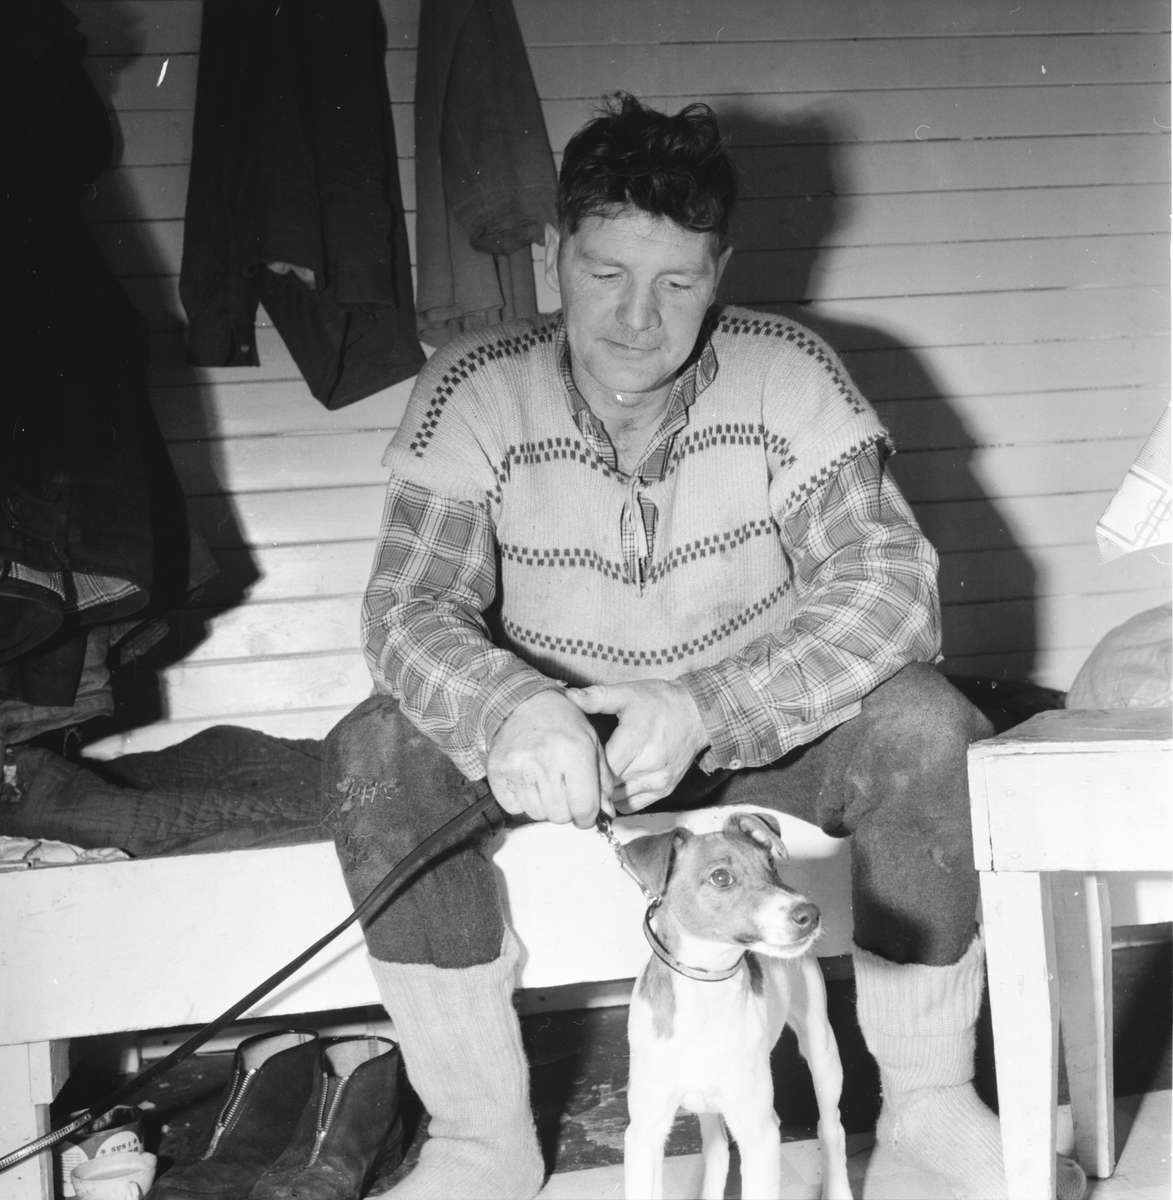 Söderlund Göte, med sönerna Leif o Janne, 5 Febr 1965